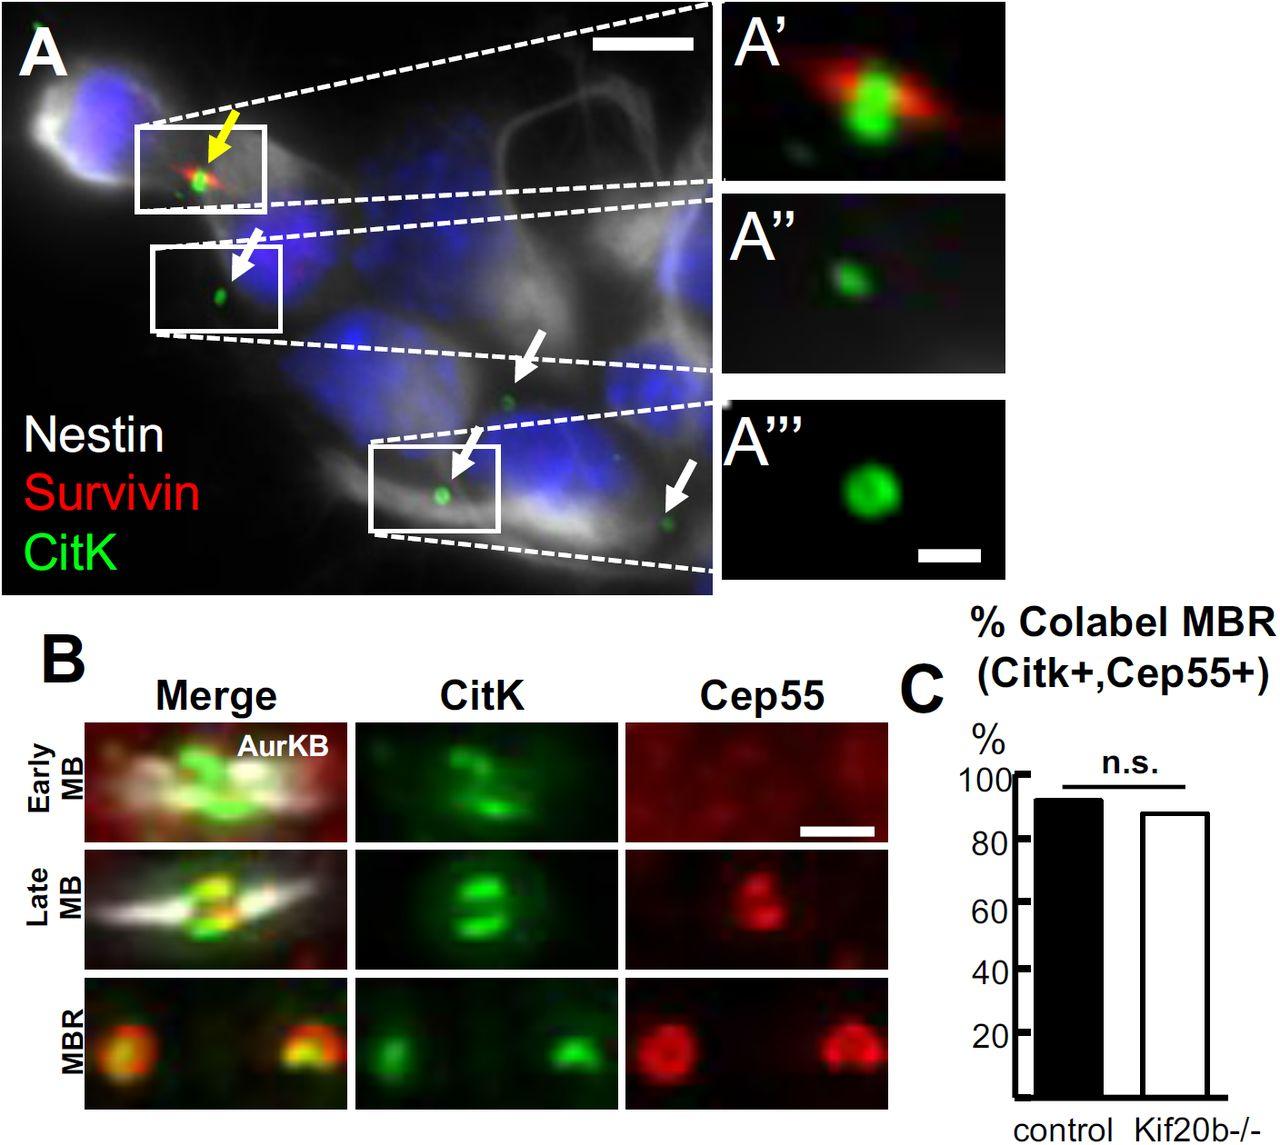 Cytokinetic abscission dynamics in neuroepithelial stem